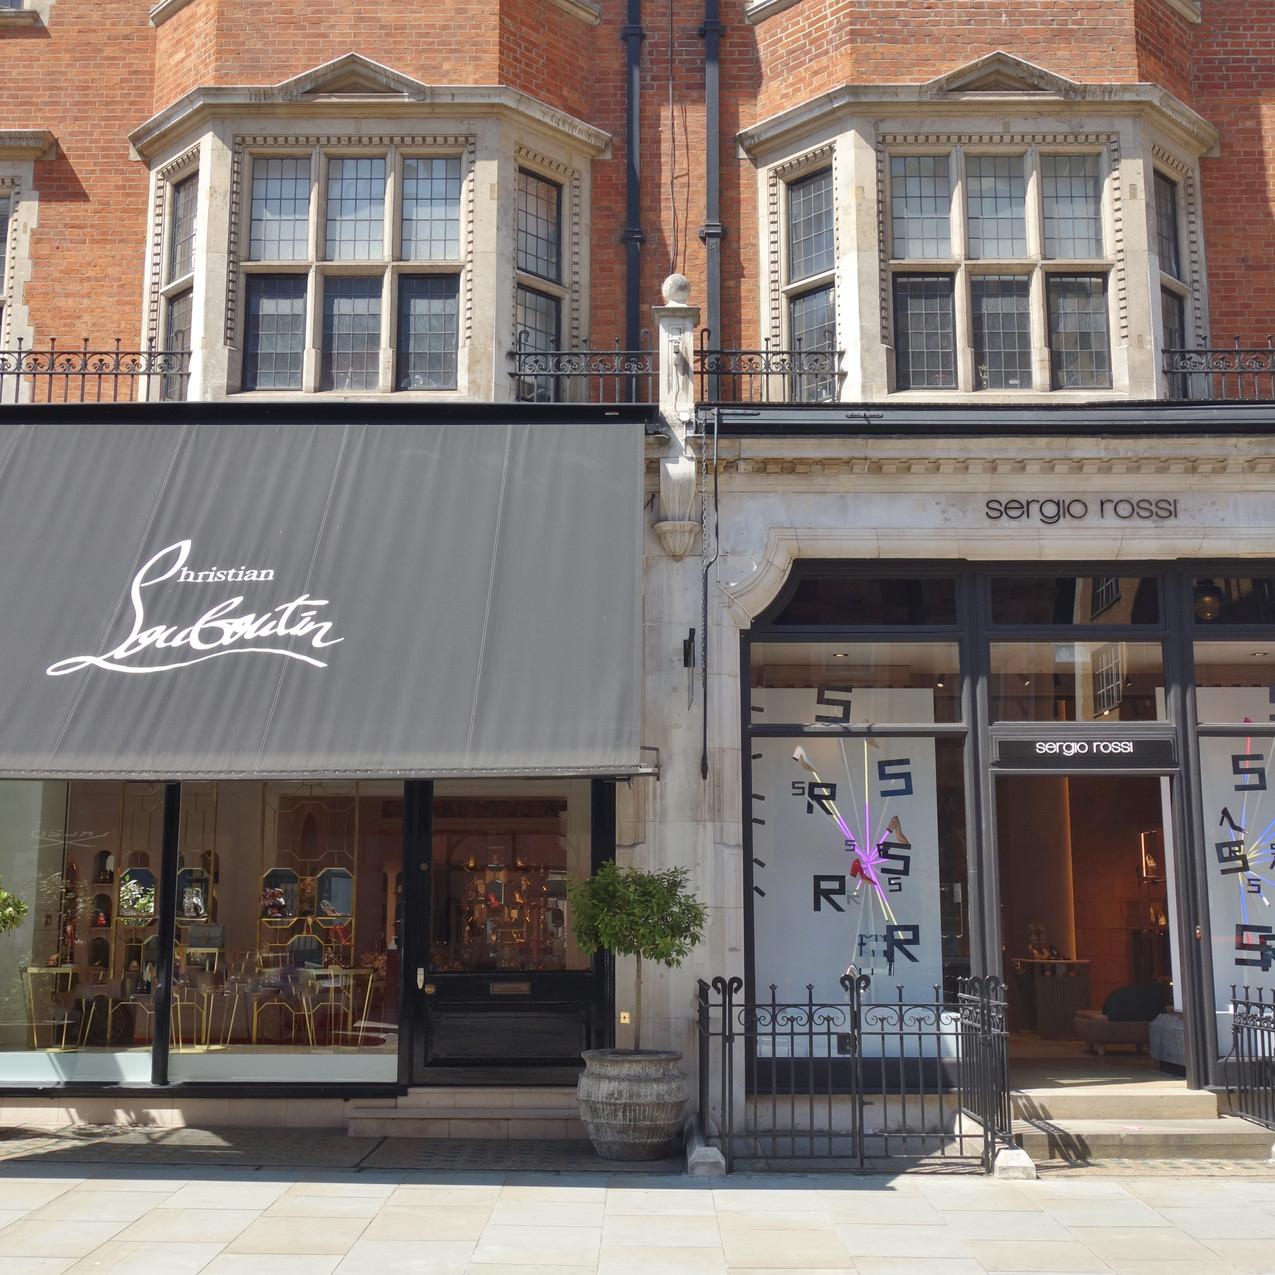 Mount Street, Mayfair